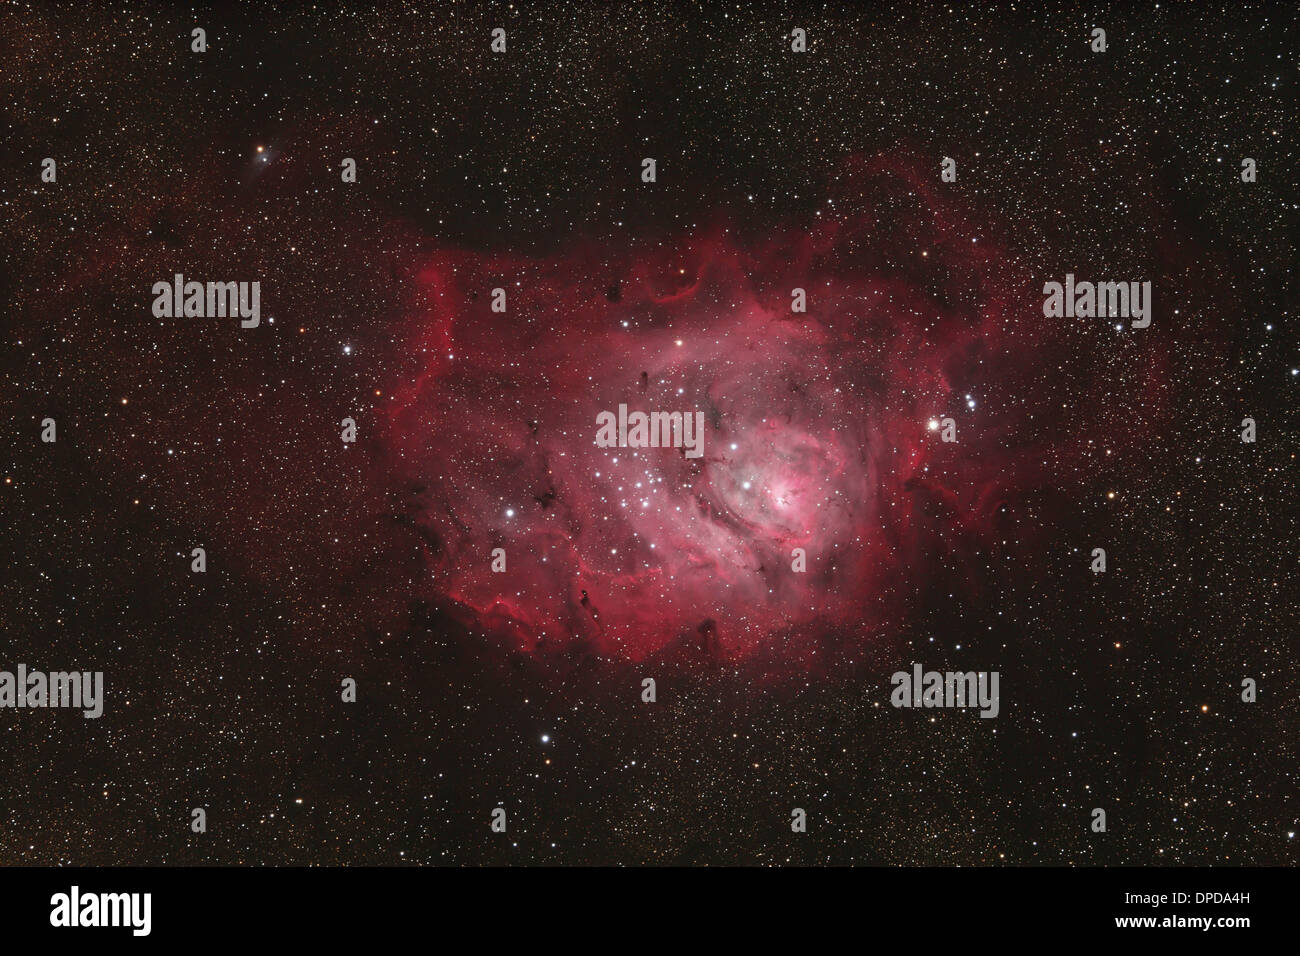 Laguna Nebula, emission nebula - Stock Image